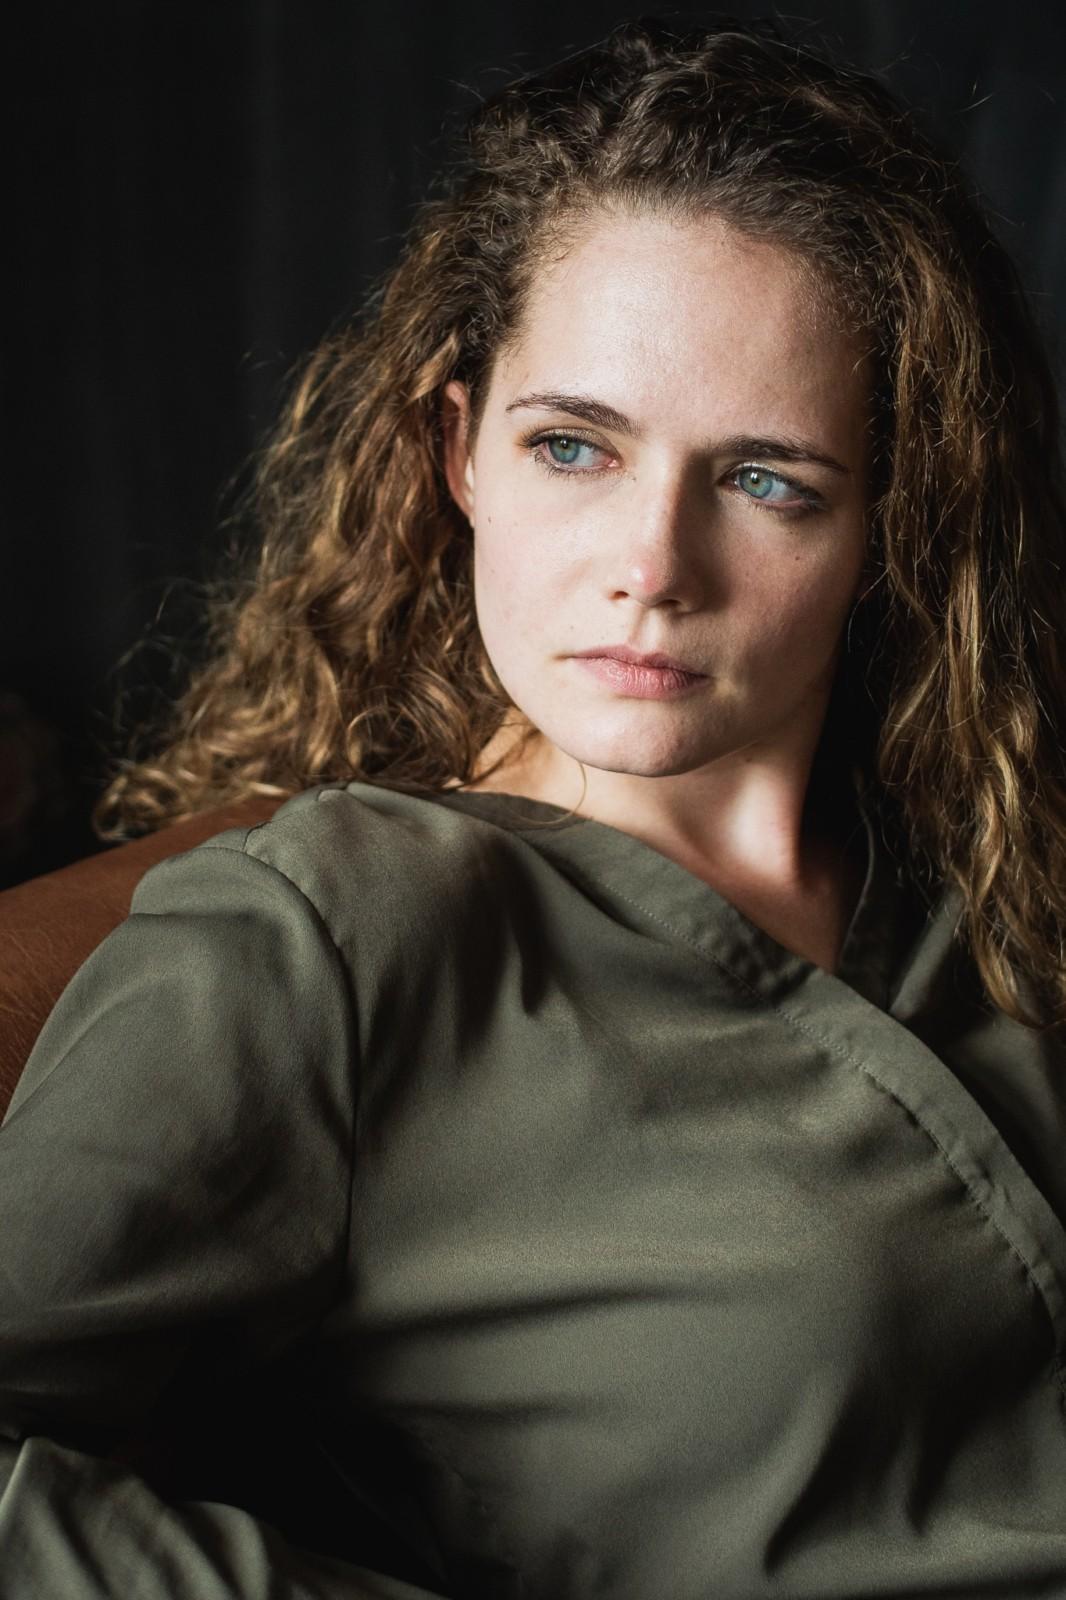 3220871 - Lisa Guzek | Actress